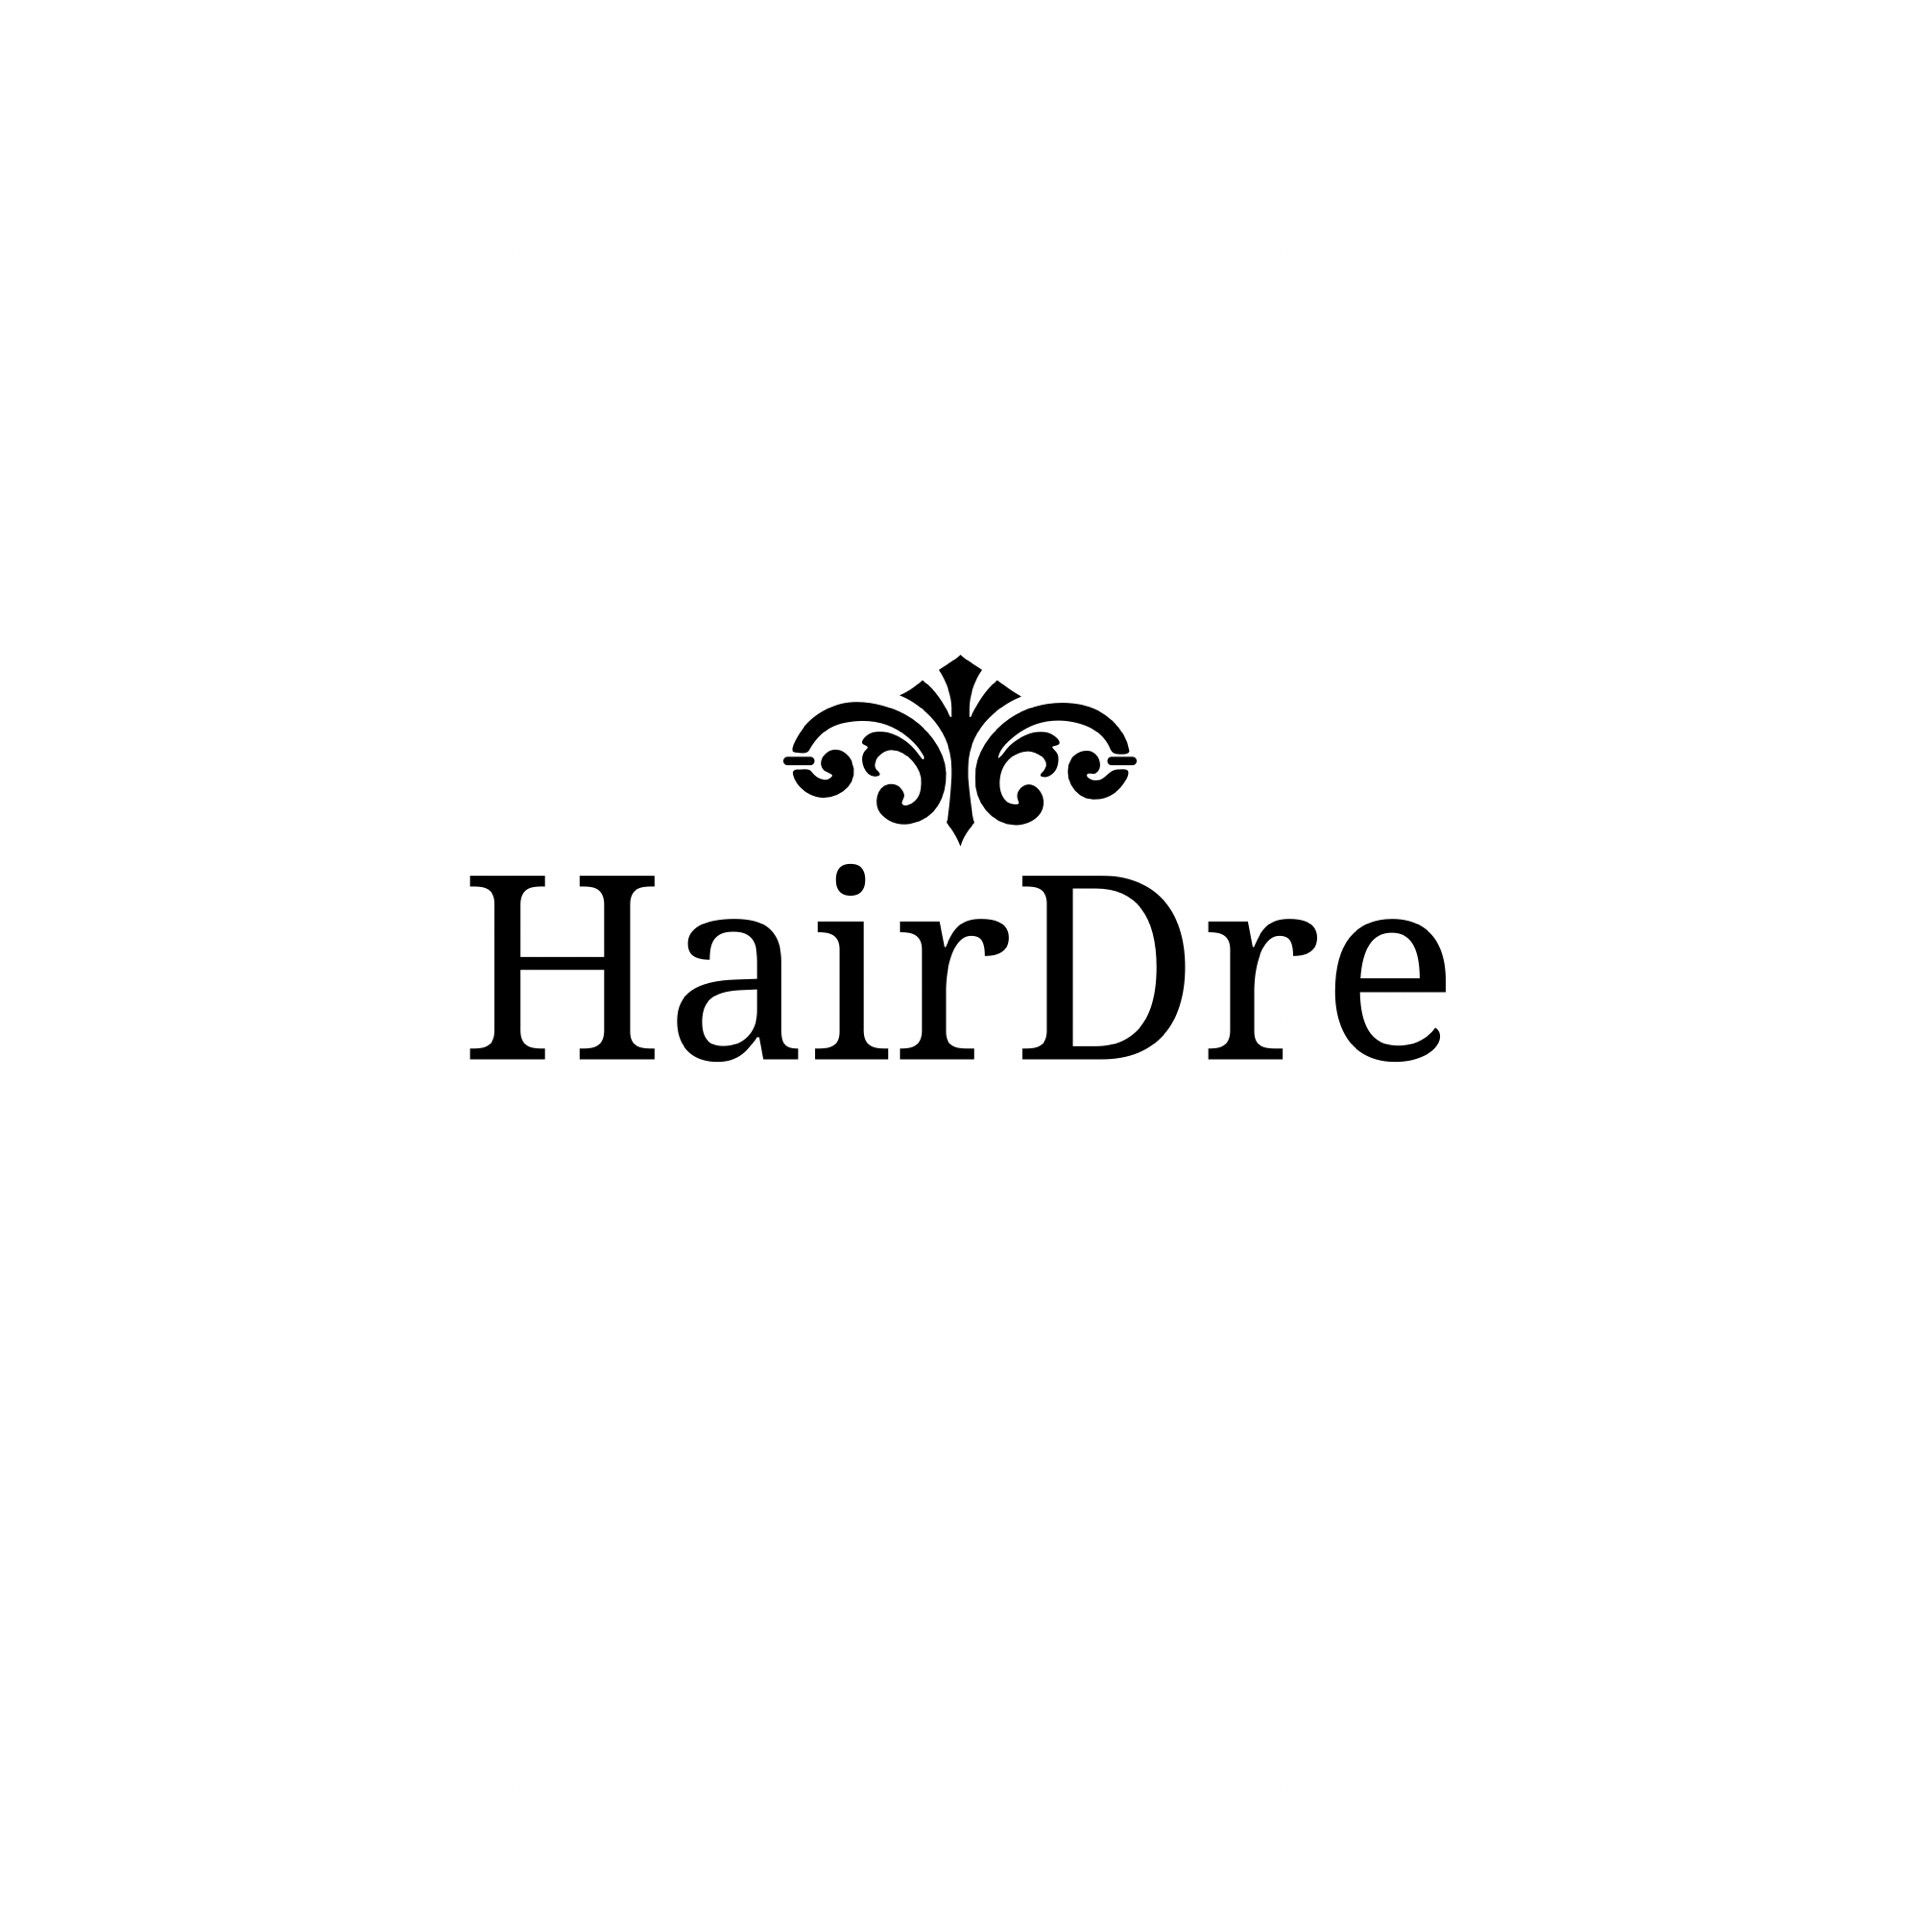 【HairDre】ヘアドレウィッグ